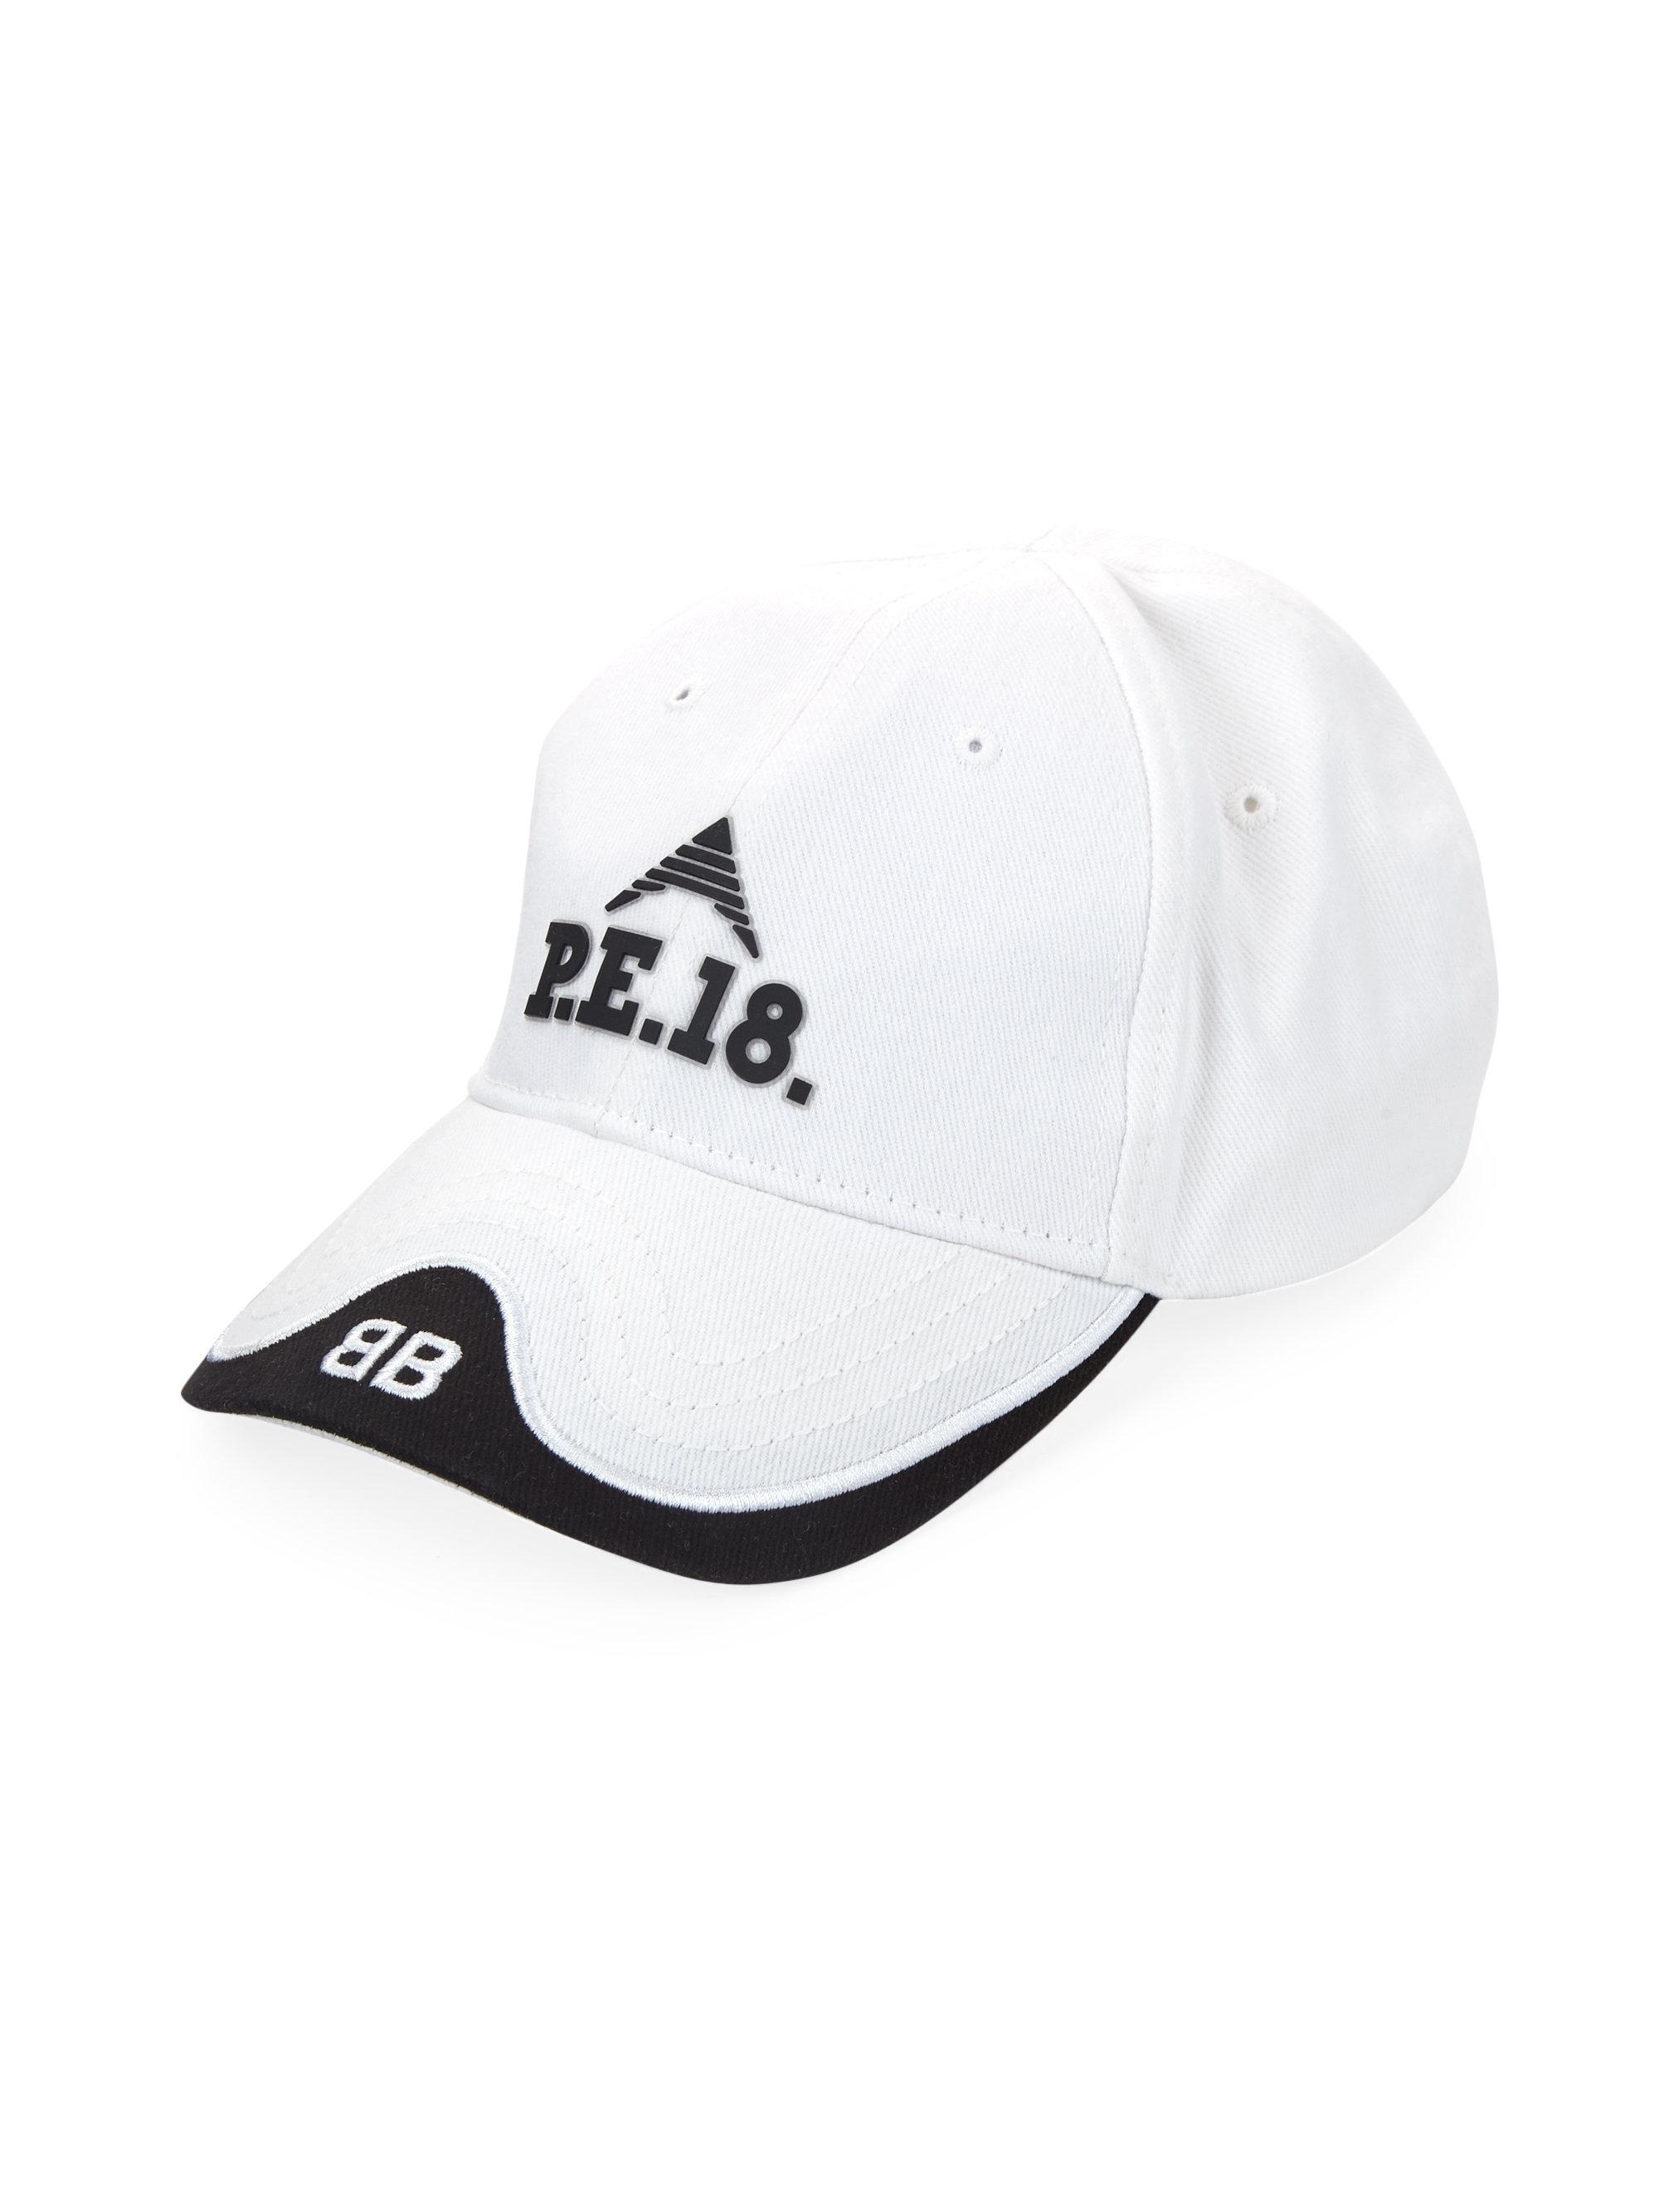 0db0795abdd Balenciaga Baseball Cap Price